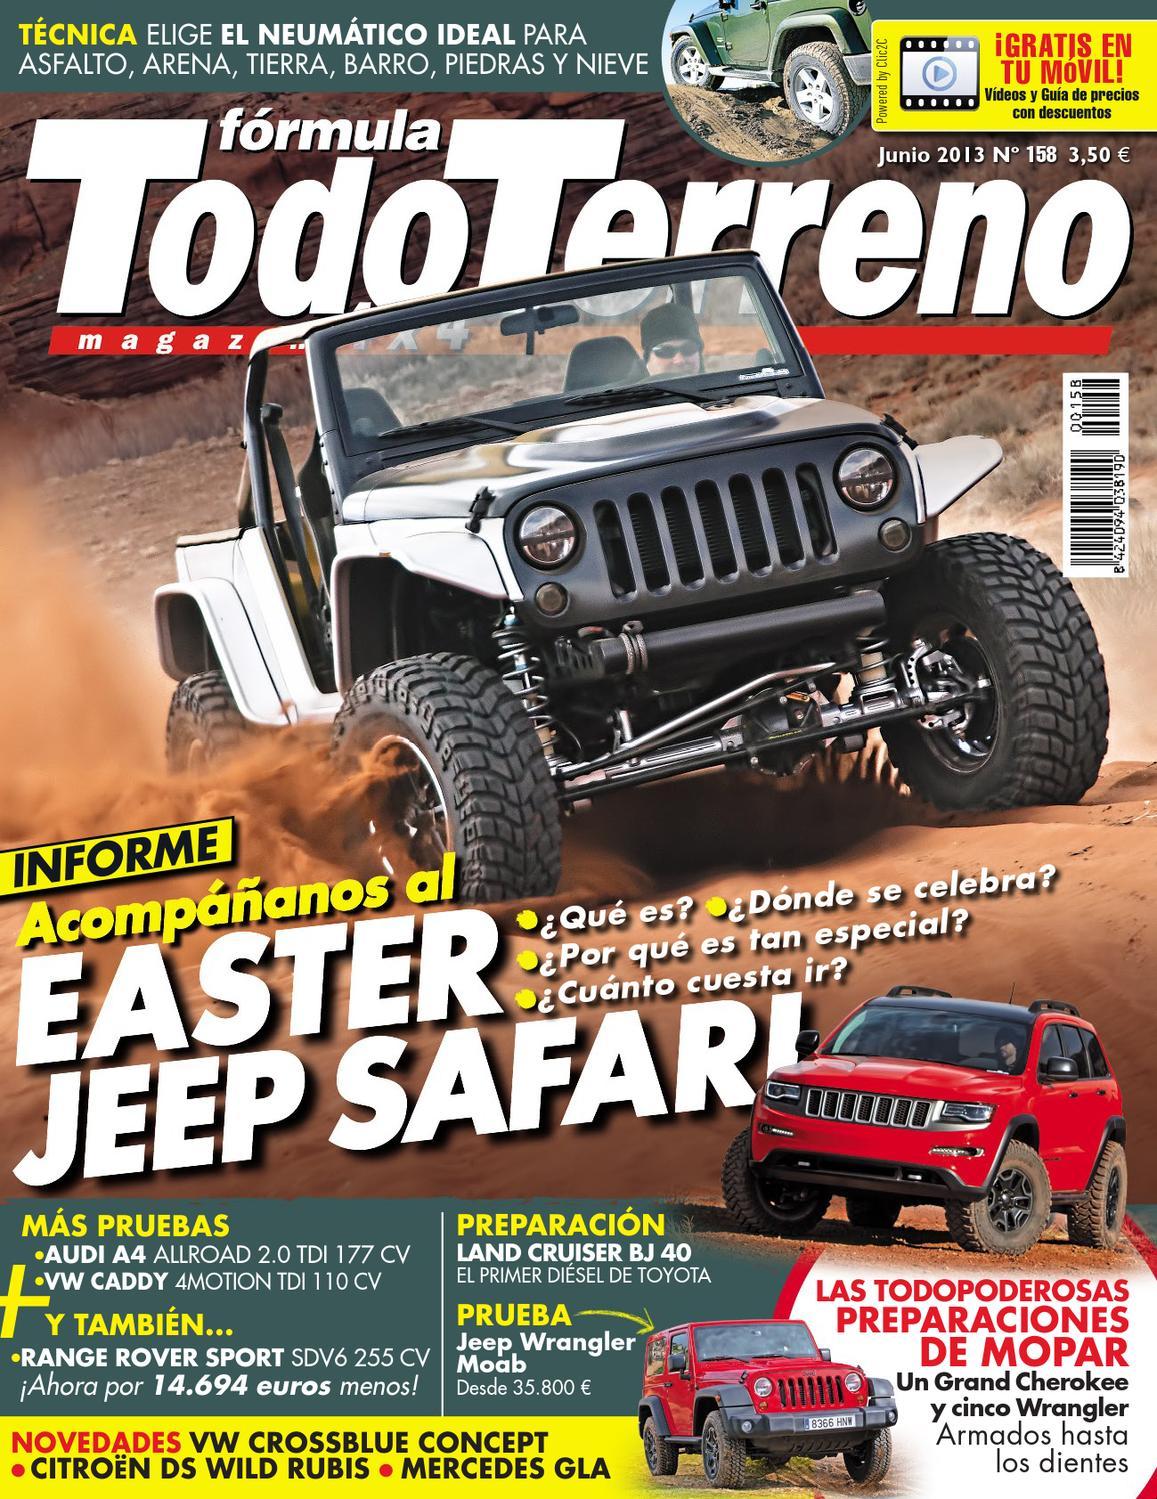 Todo Terreno Nº158 Junio 2013 by LIDER - issuu